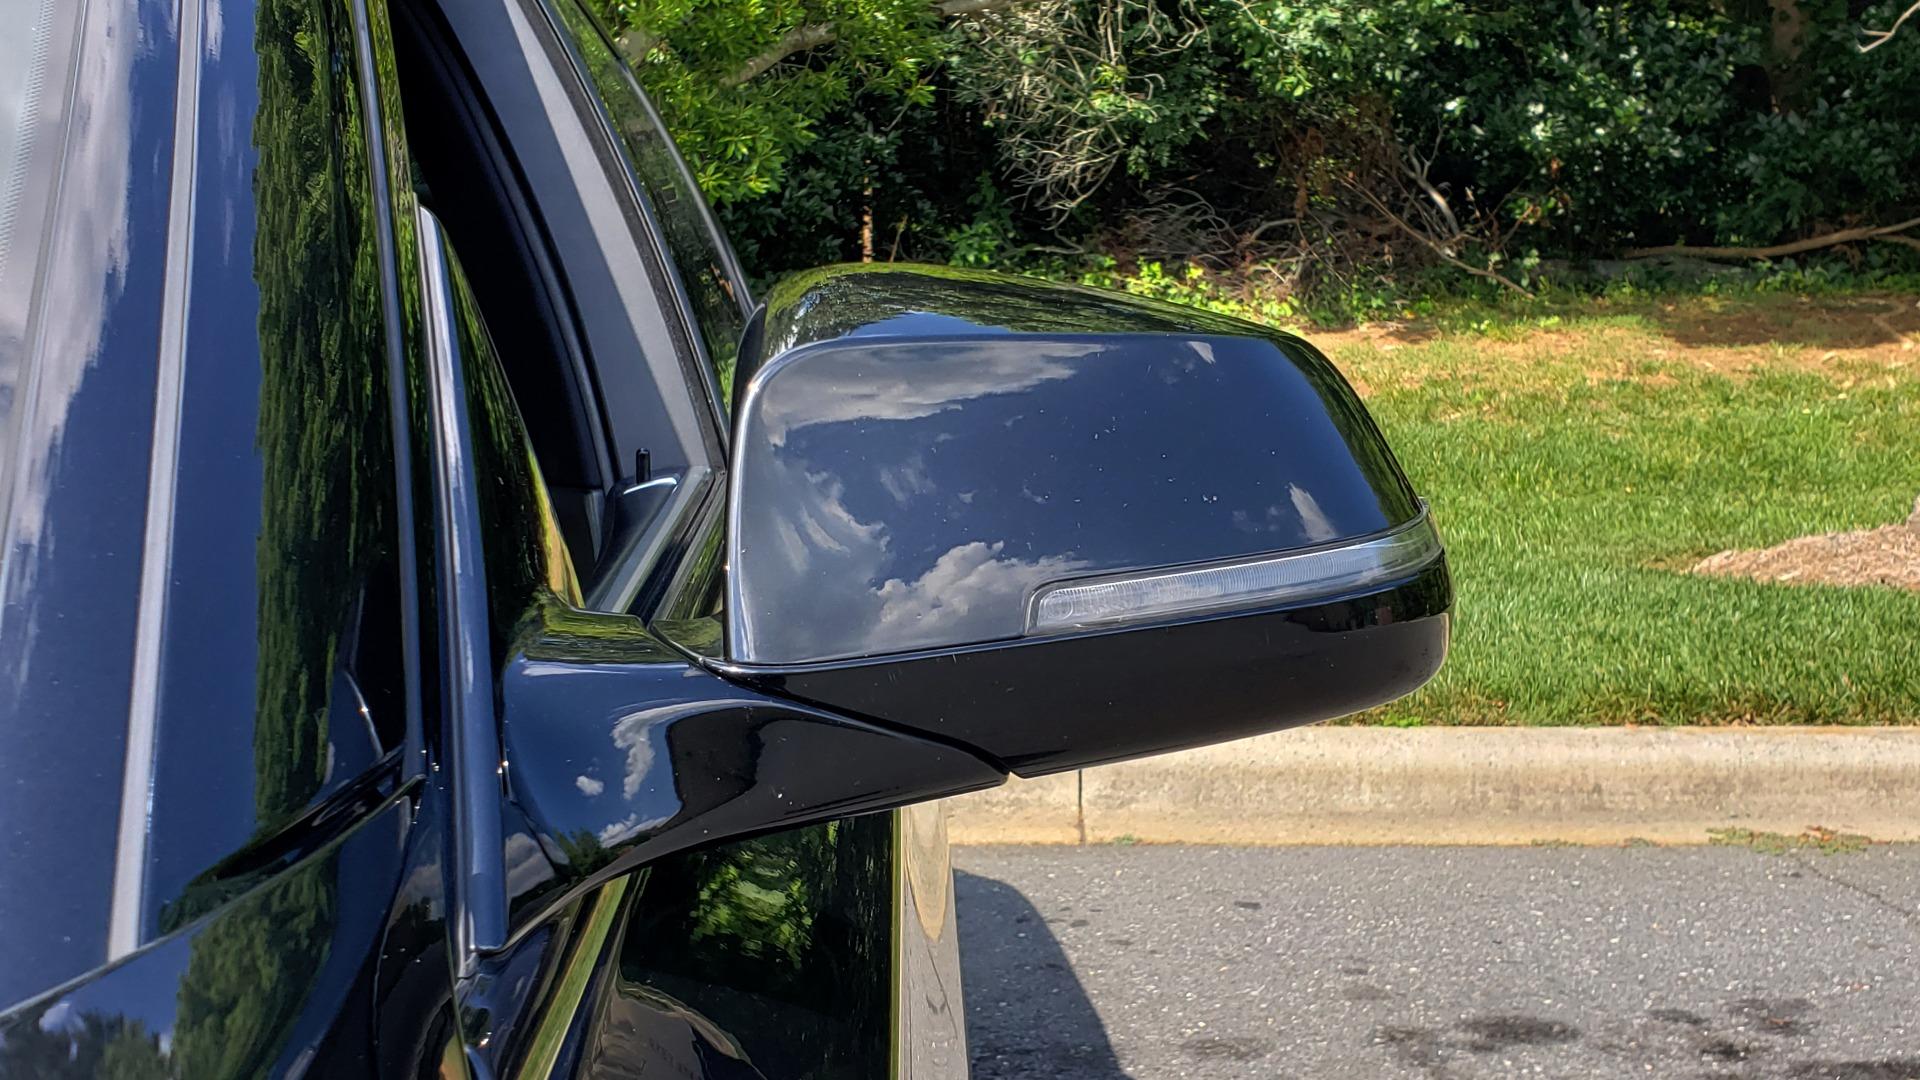 Used 2014 BMW 7 SERIES 750LI M-SPORT / EXEC PKG / DRVR ASST / LIGHTING / NAV / SUNROOF for sale Sold at Formula Imports in Charlotte NC 28227 22